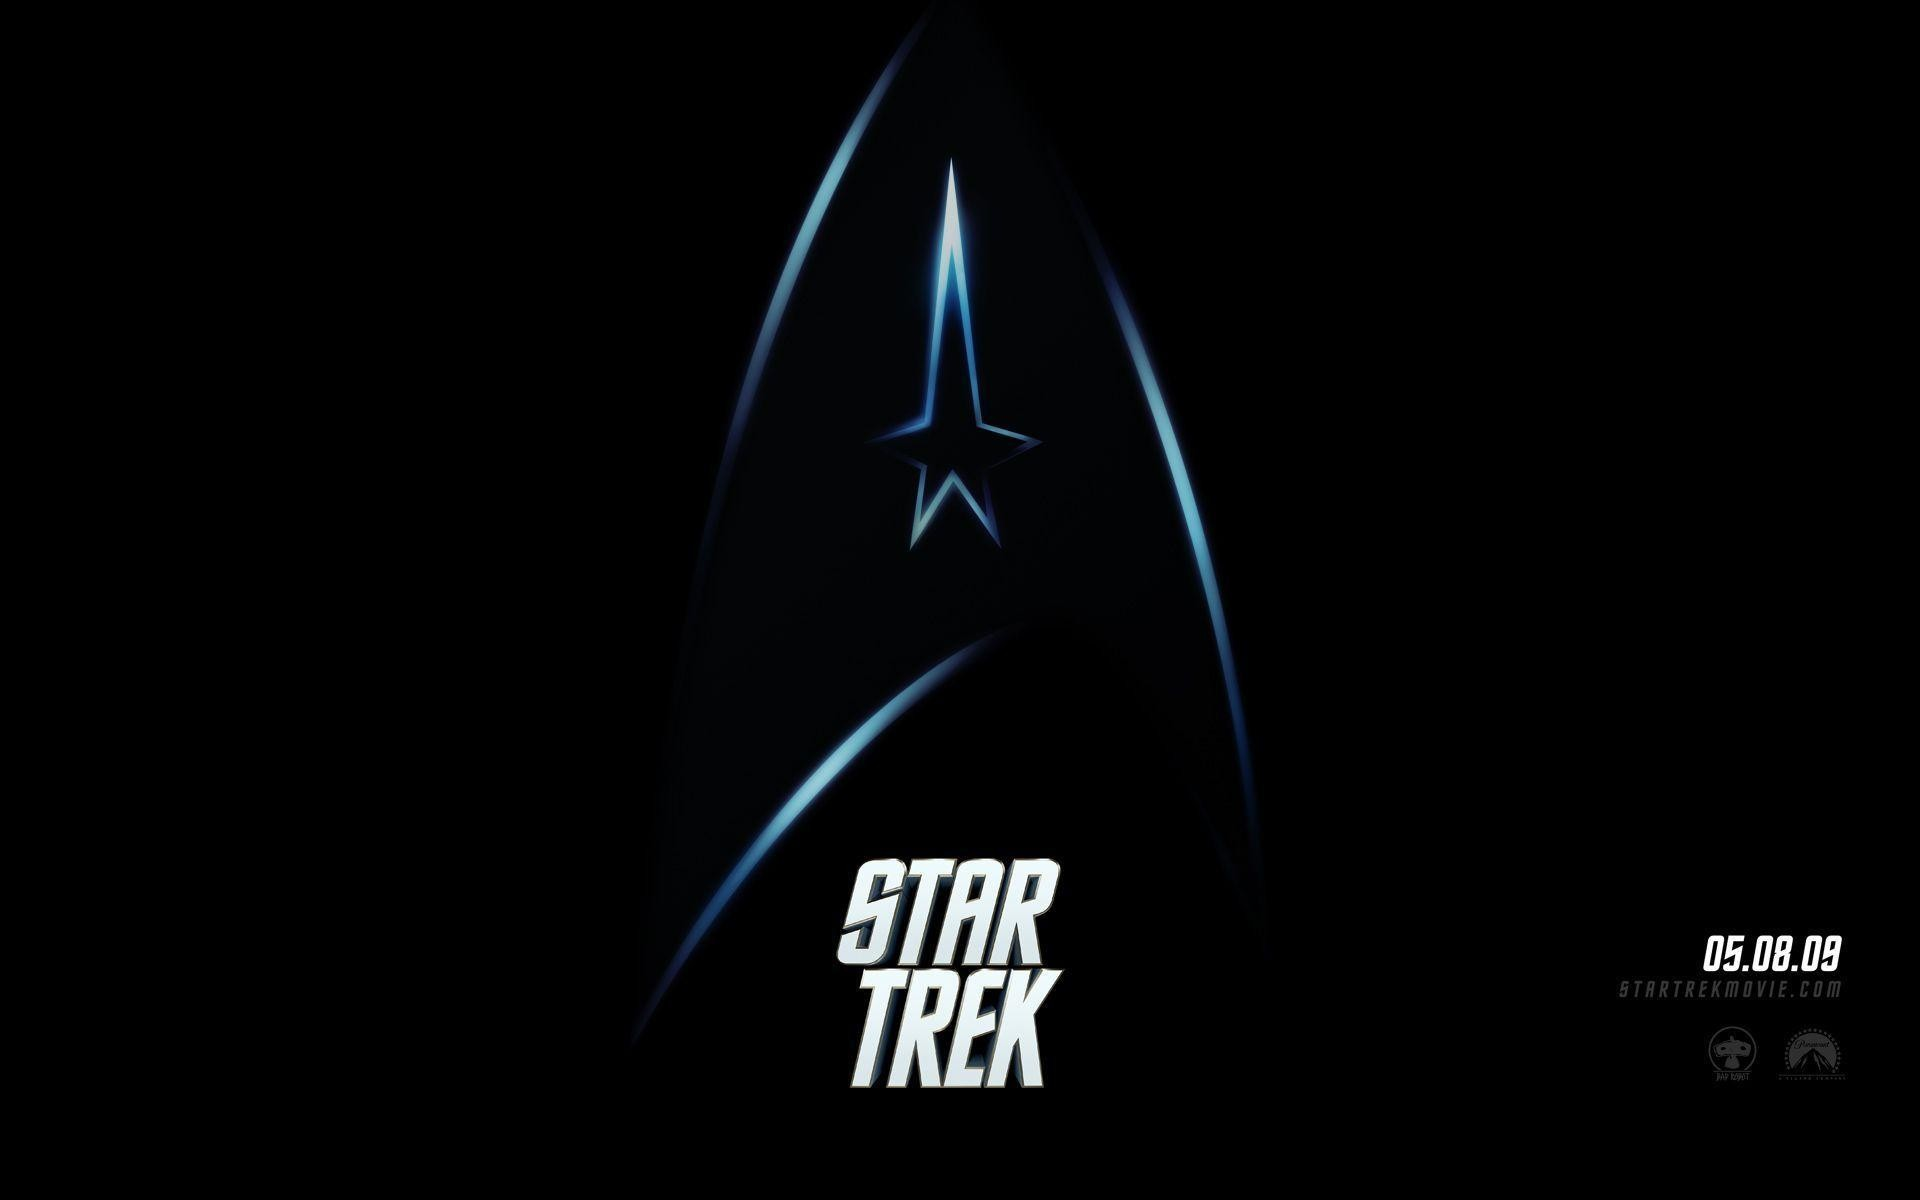 Star Trek Wallpapers – Full HD wallpaper search – page 25